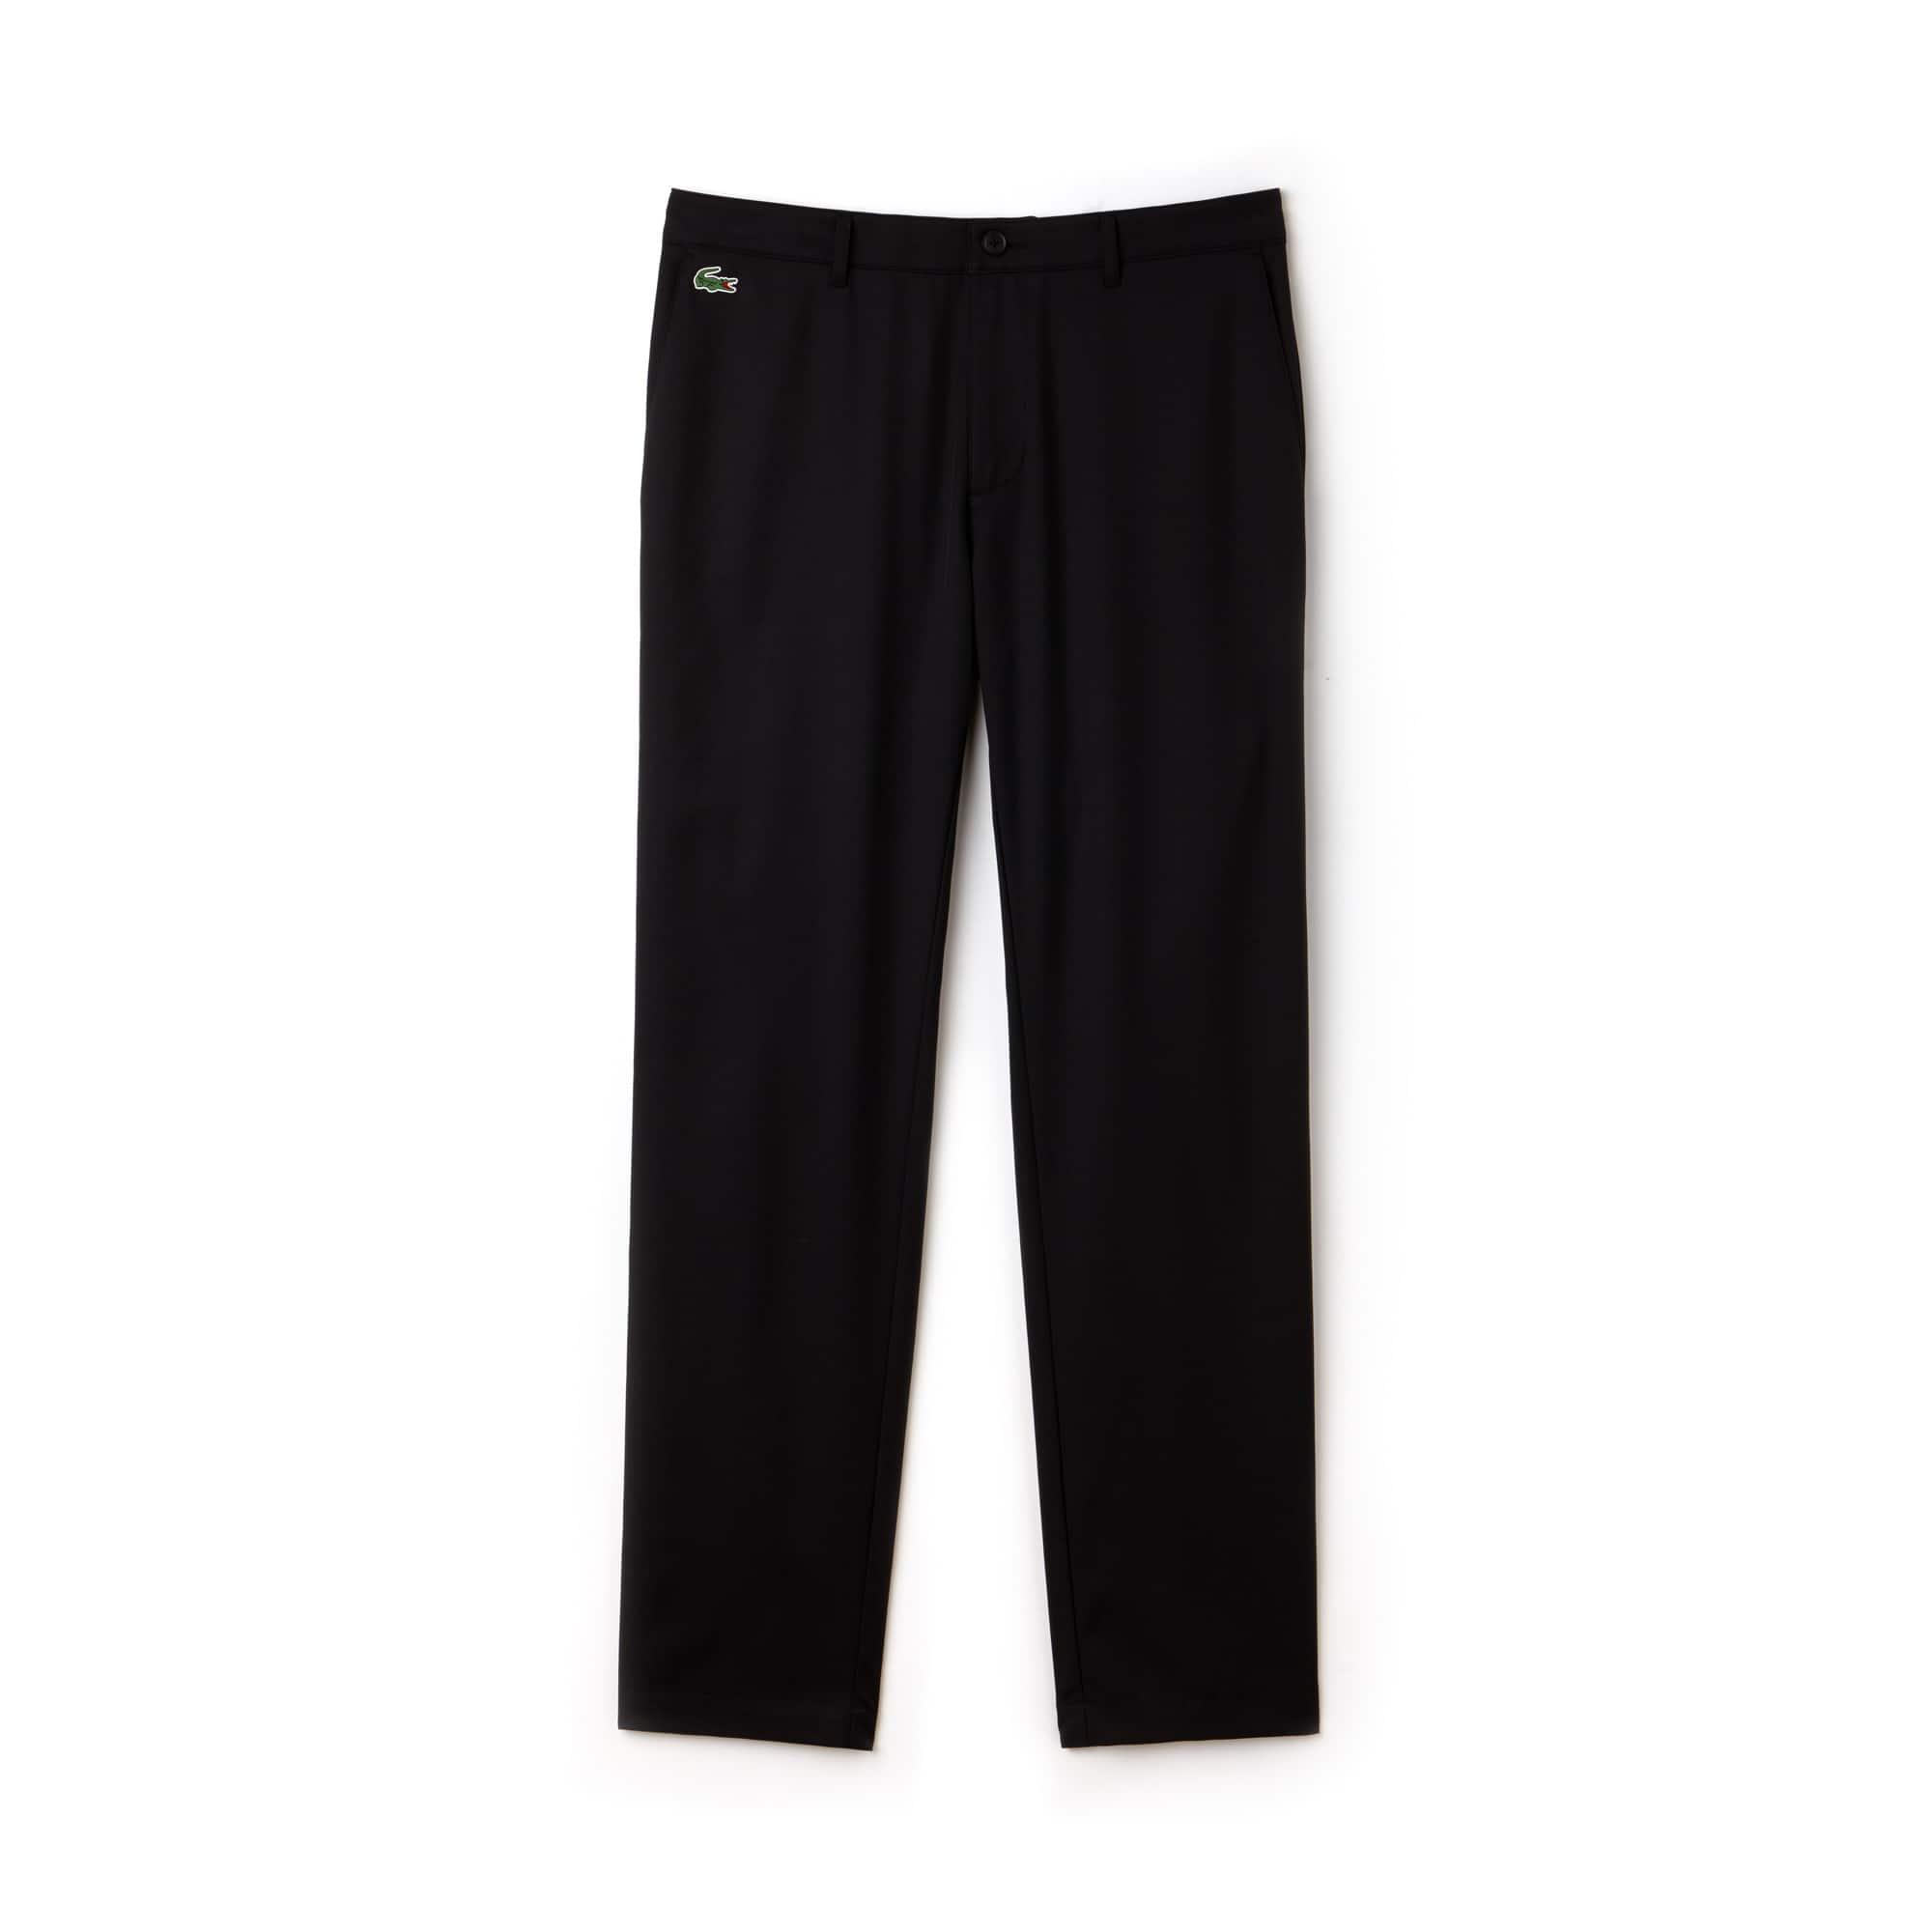 Men's Lacoste SPORT Technical Gabardine Golf Chino Pants